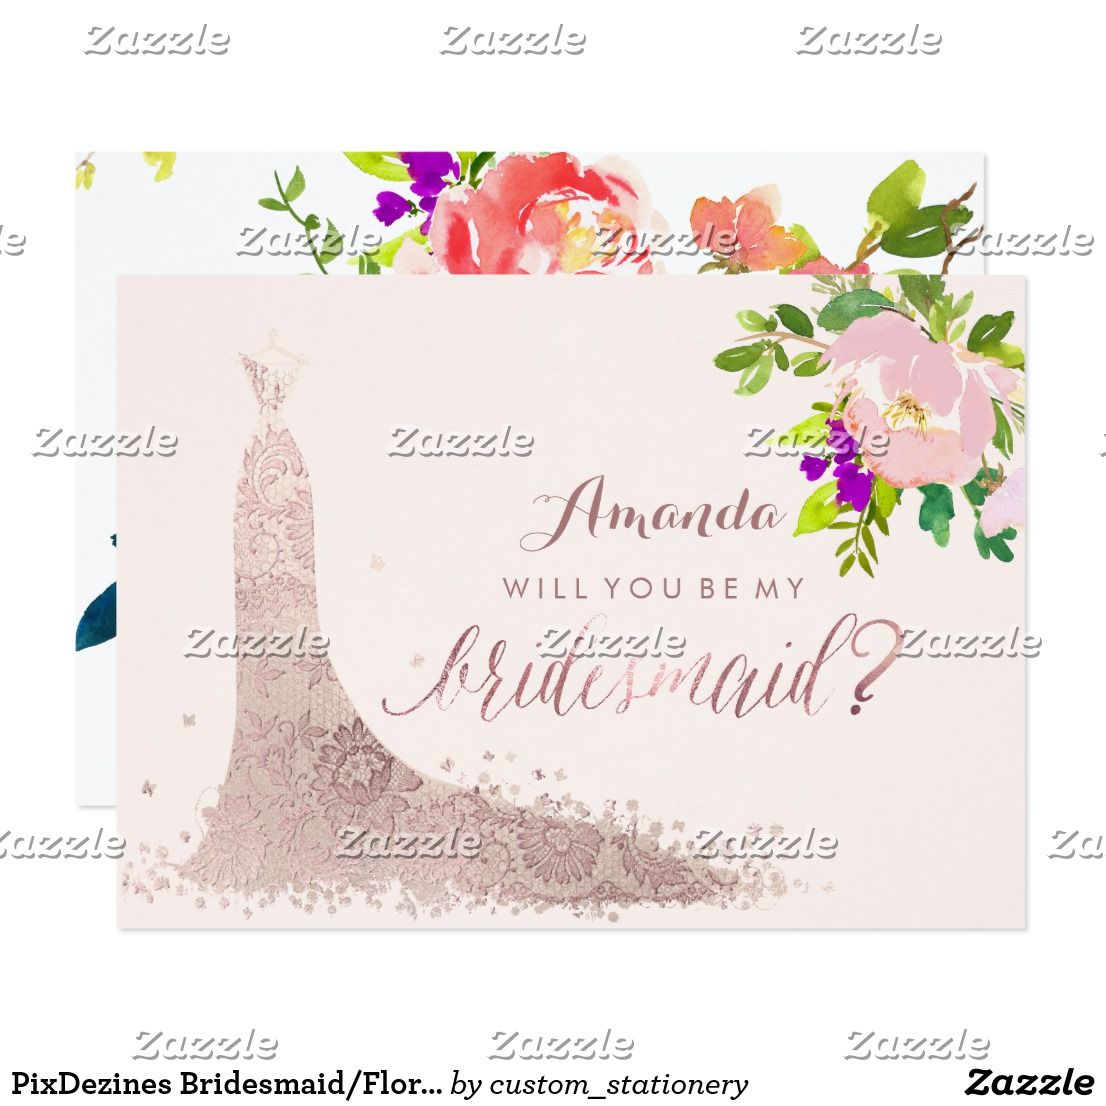 pixdezines bridesmaid floral watercolor spring card pixdezines will